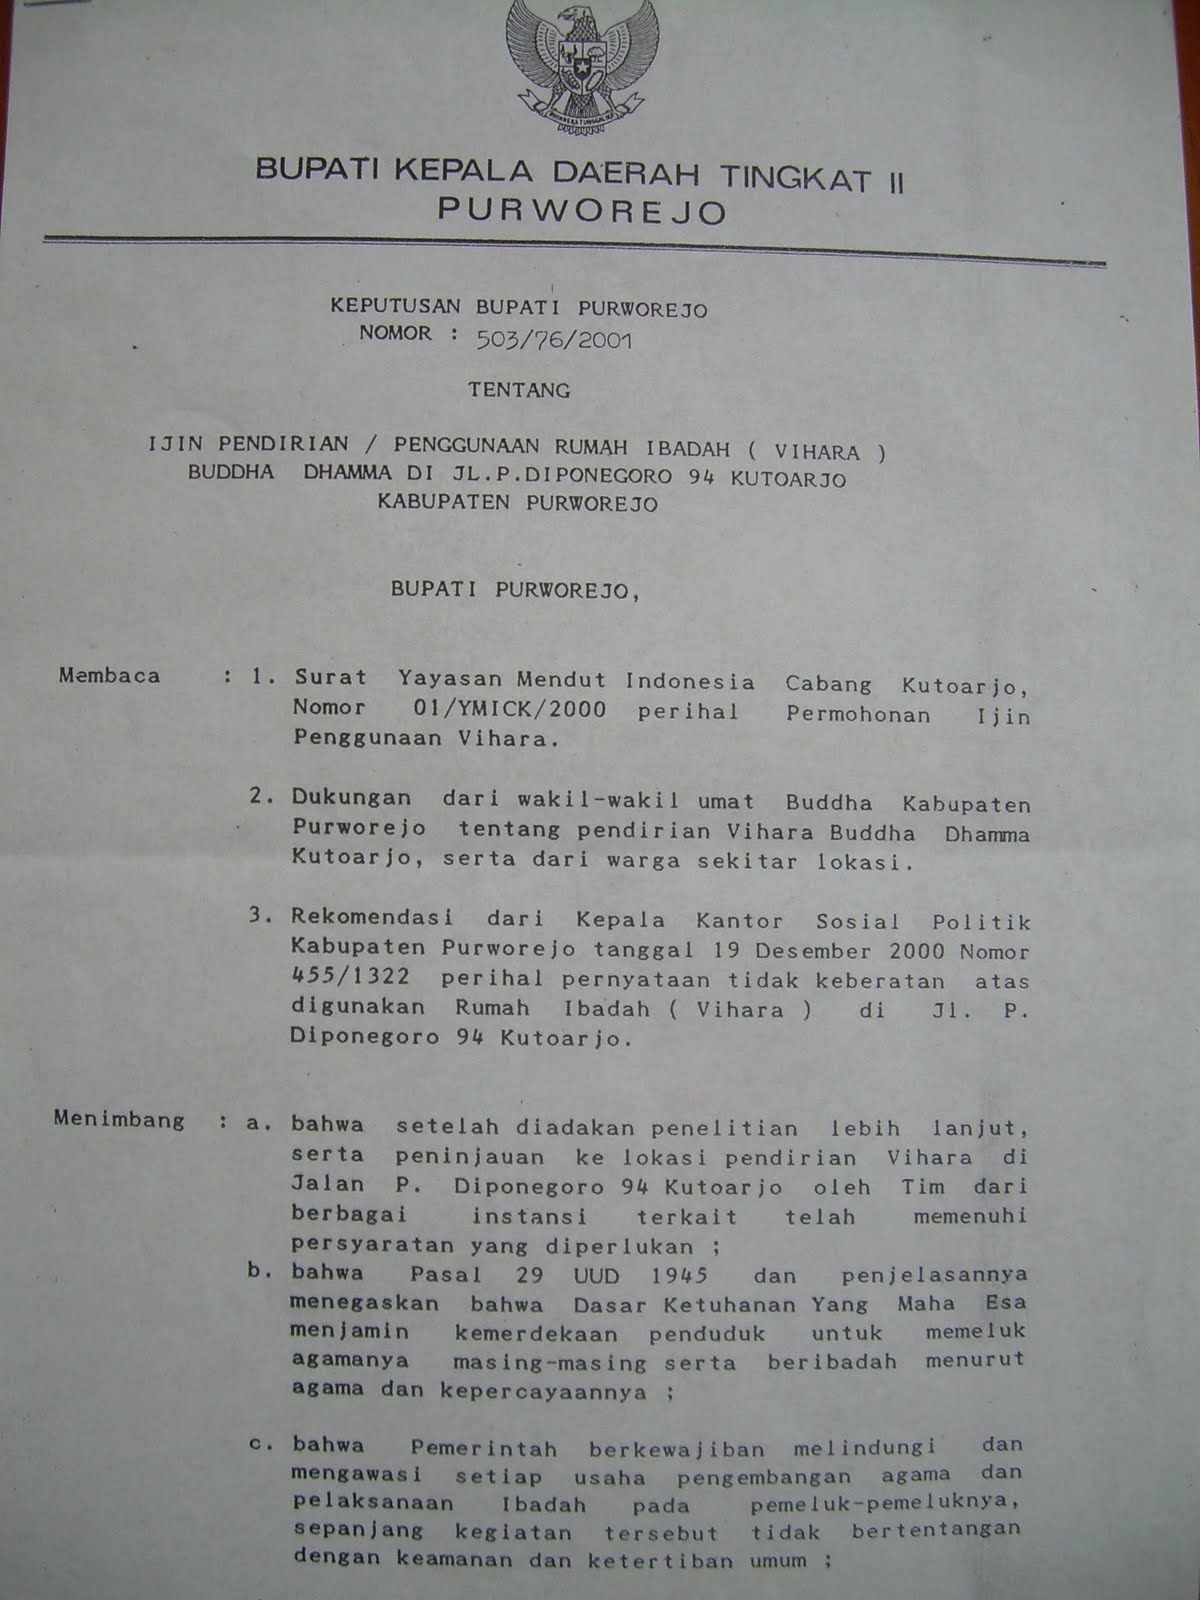 Vihara Buddha Dhamma Kutoarjo: Decision letter from Bupati Purworejo ...